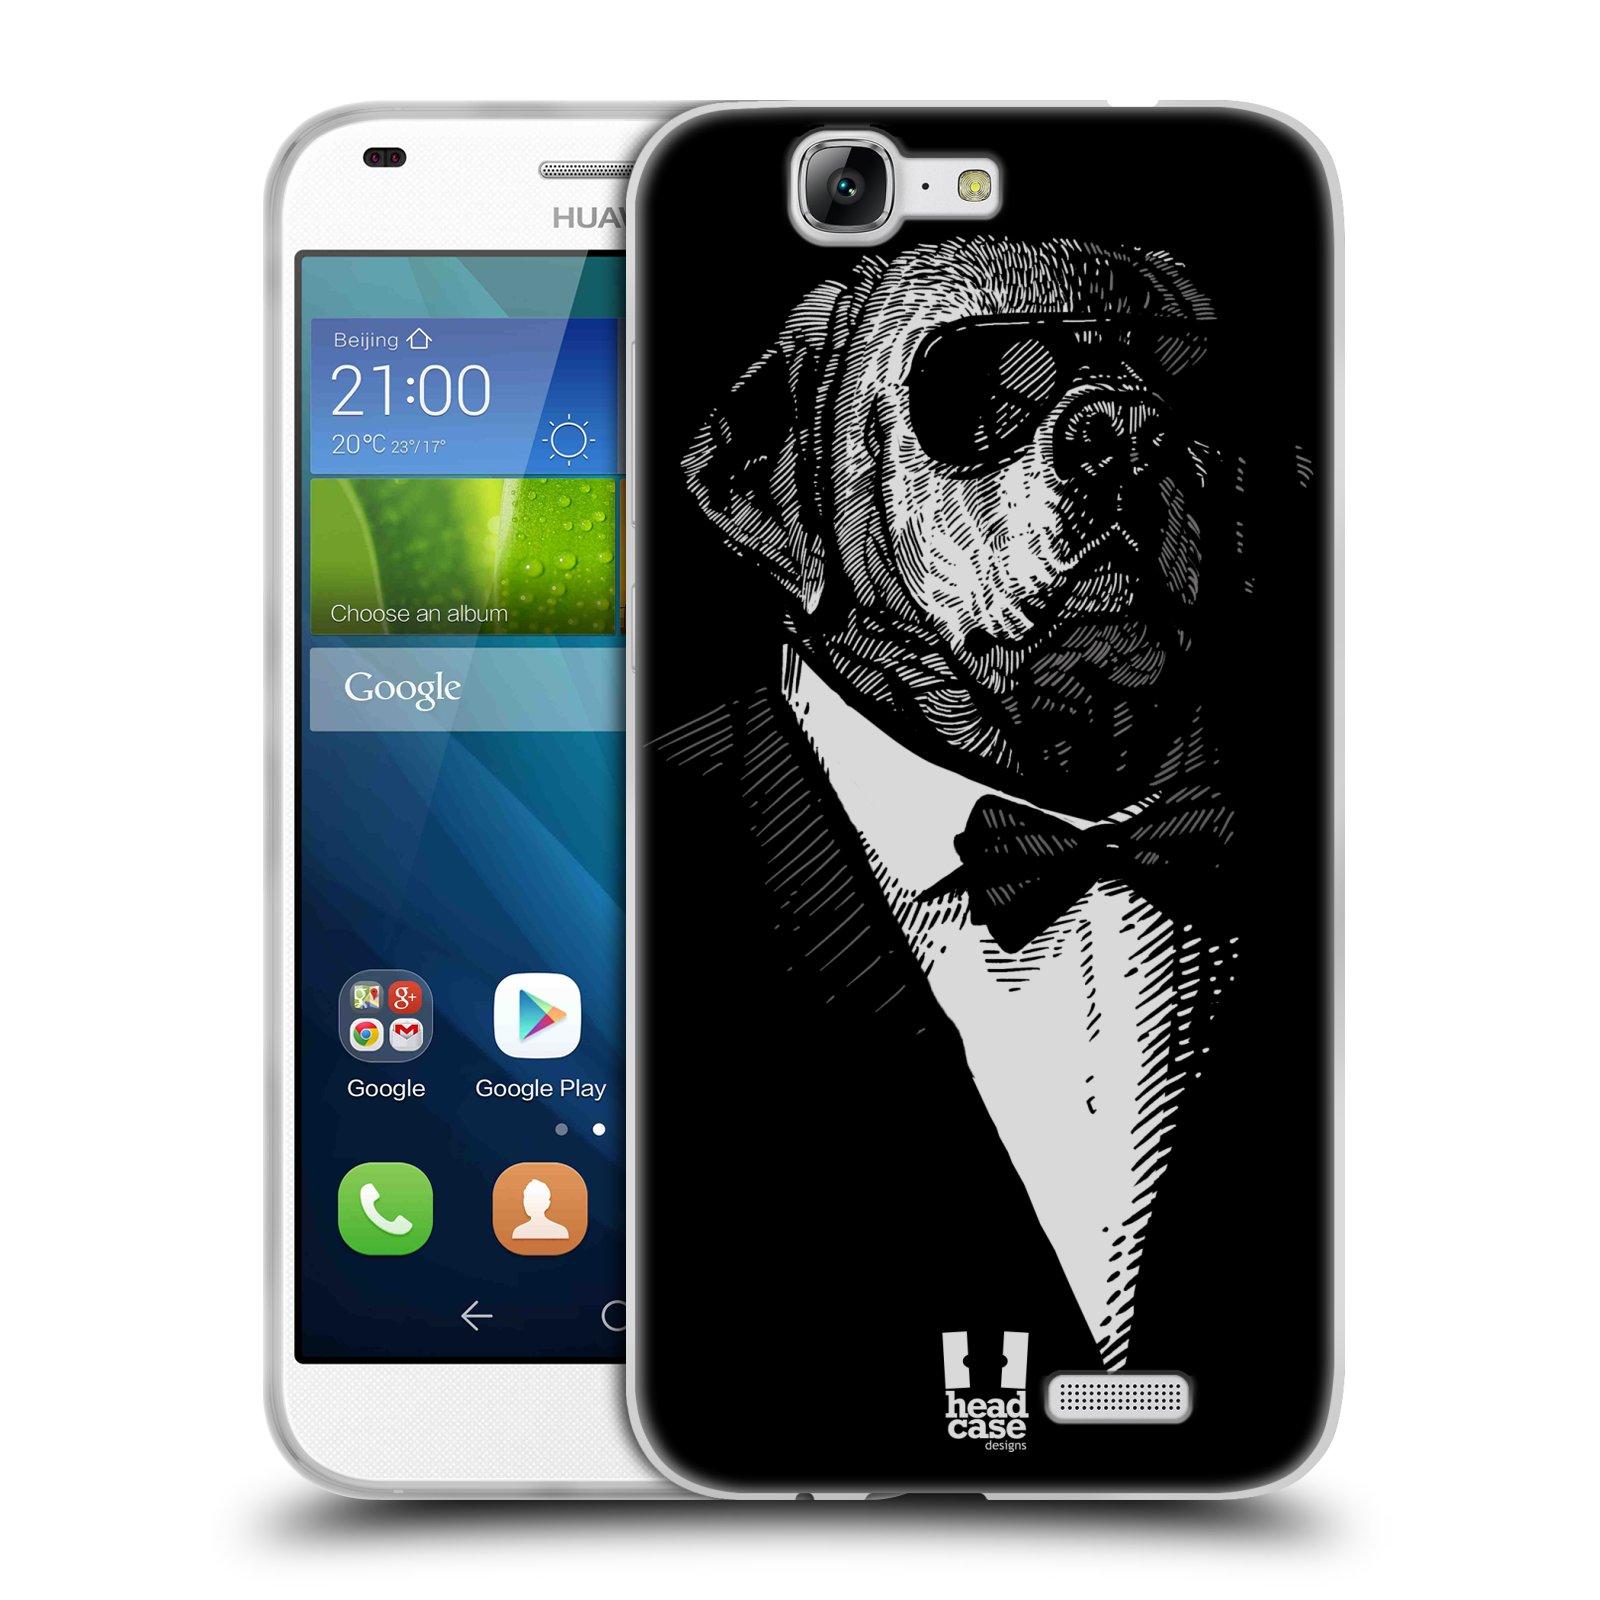 Silikonové pouzdro na mobil Huawei Ascend G7 HEAD CASE PSISKO V KVÁDRU (Silikonový kryt či obal na mobilní telefon Huawei Ascend G7)